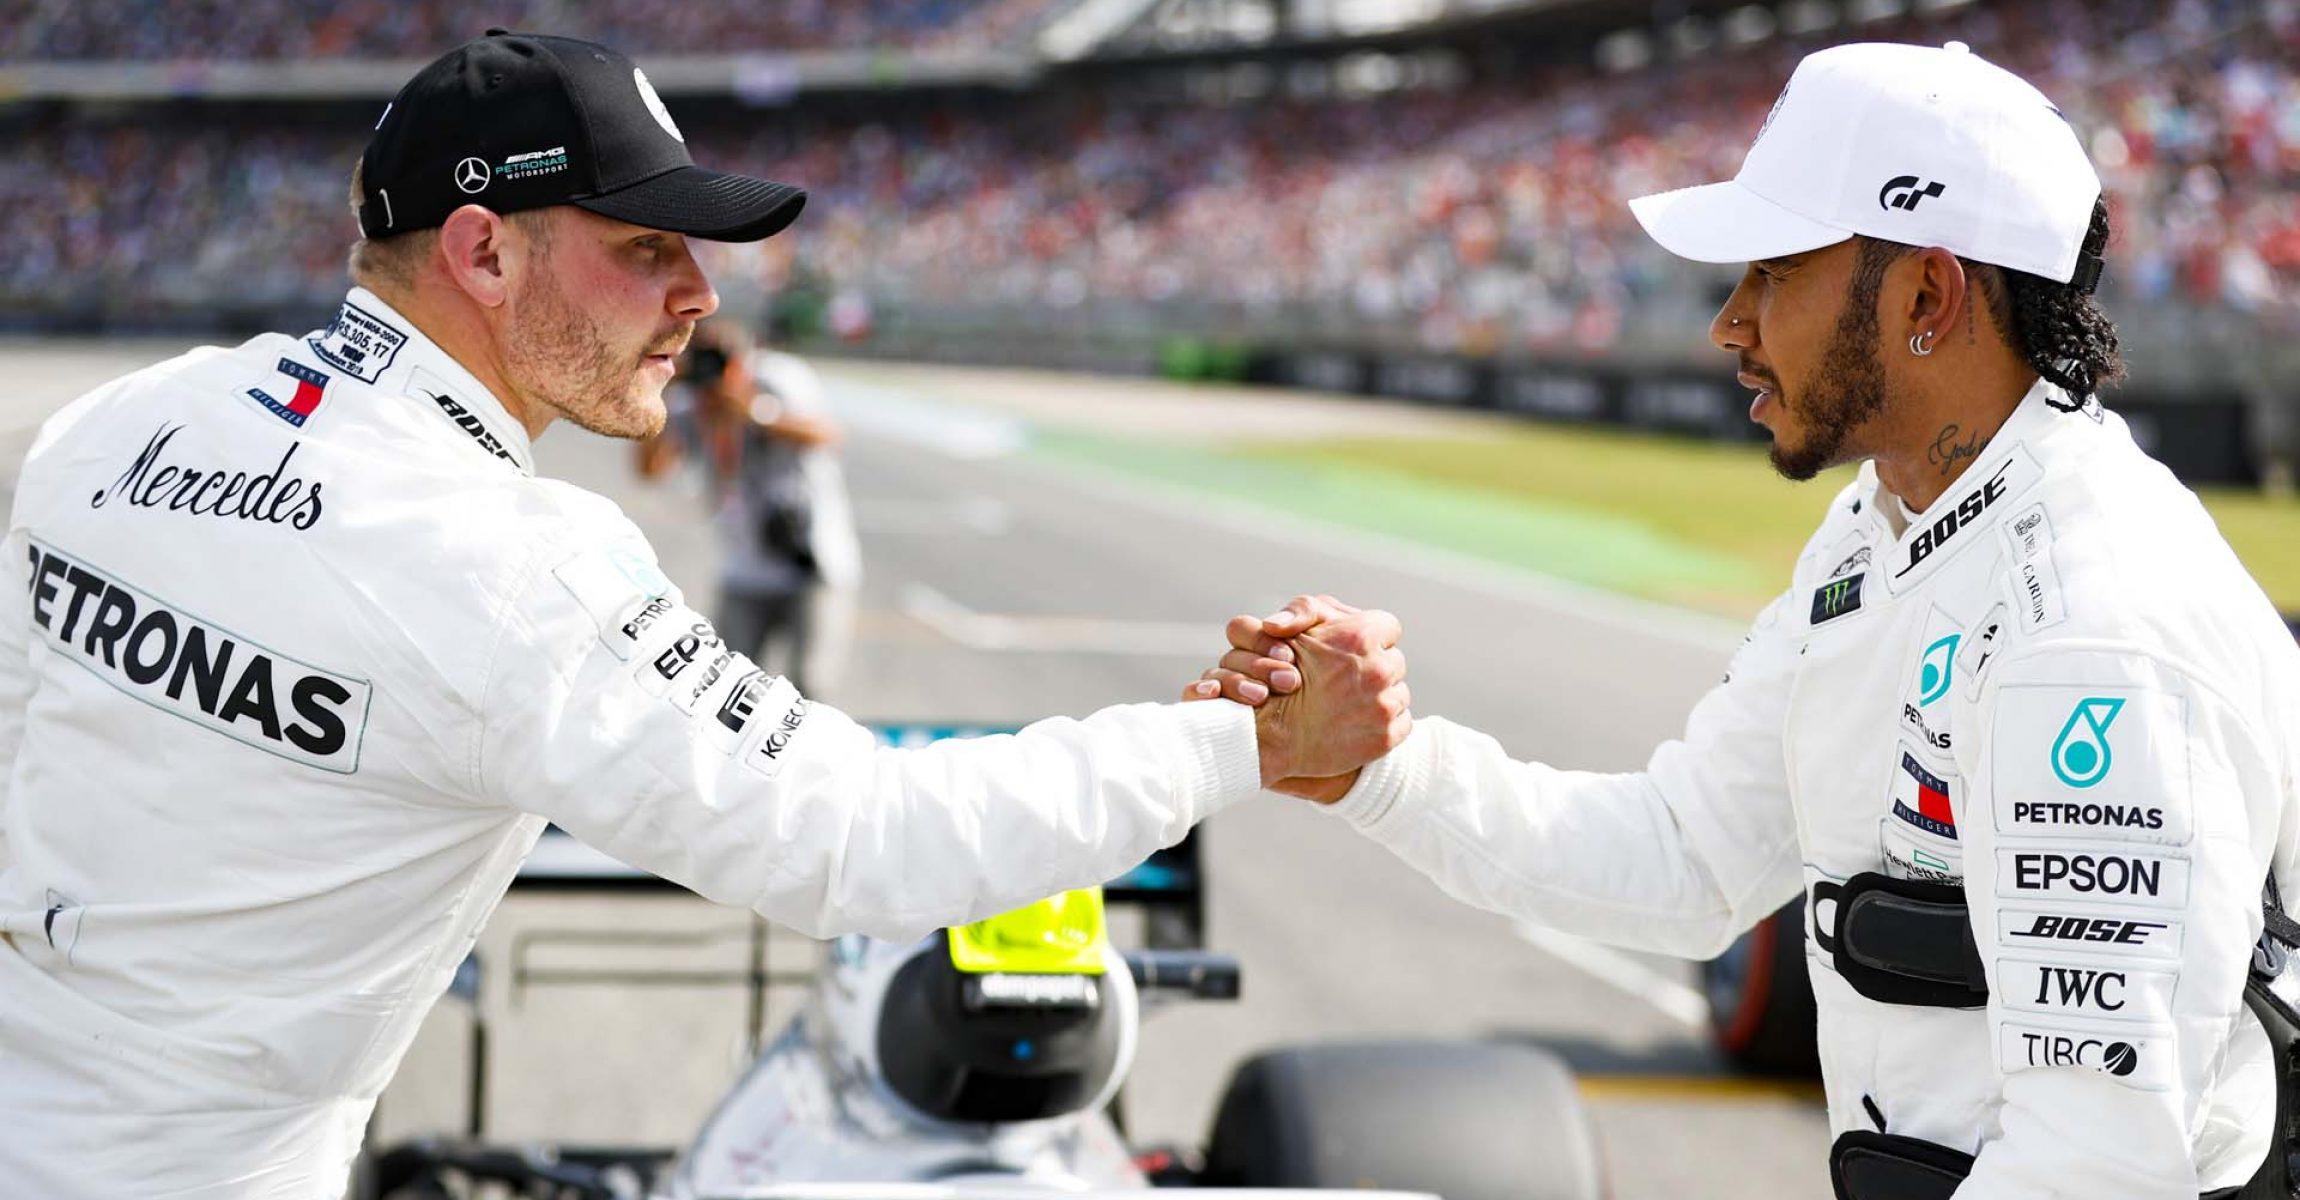 2019 German Grand Prix, Saturday - LAT Images Valtteri Bottas Mercedes Lewis Hamilton